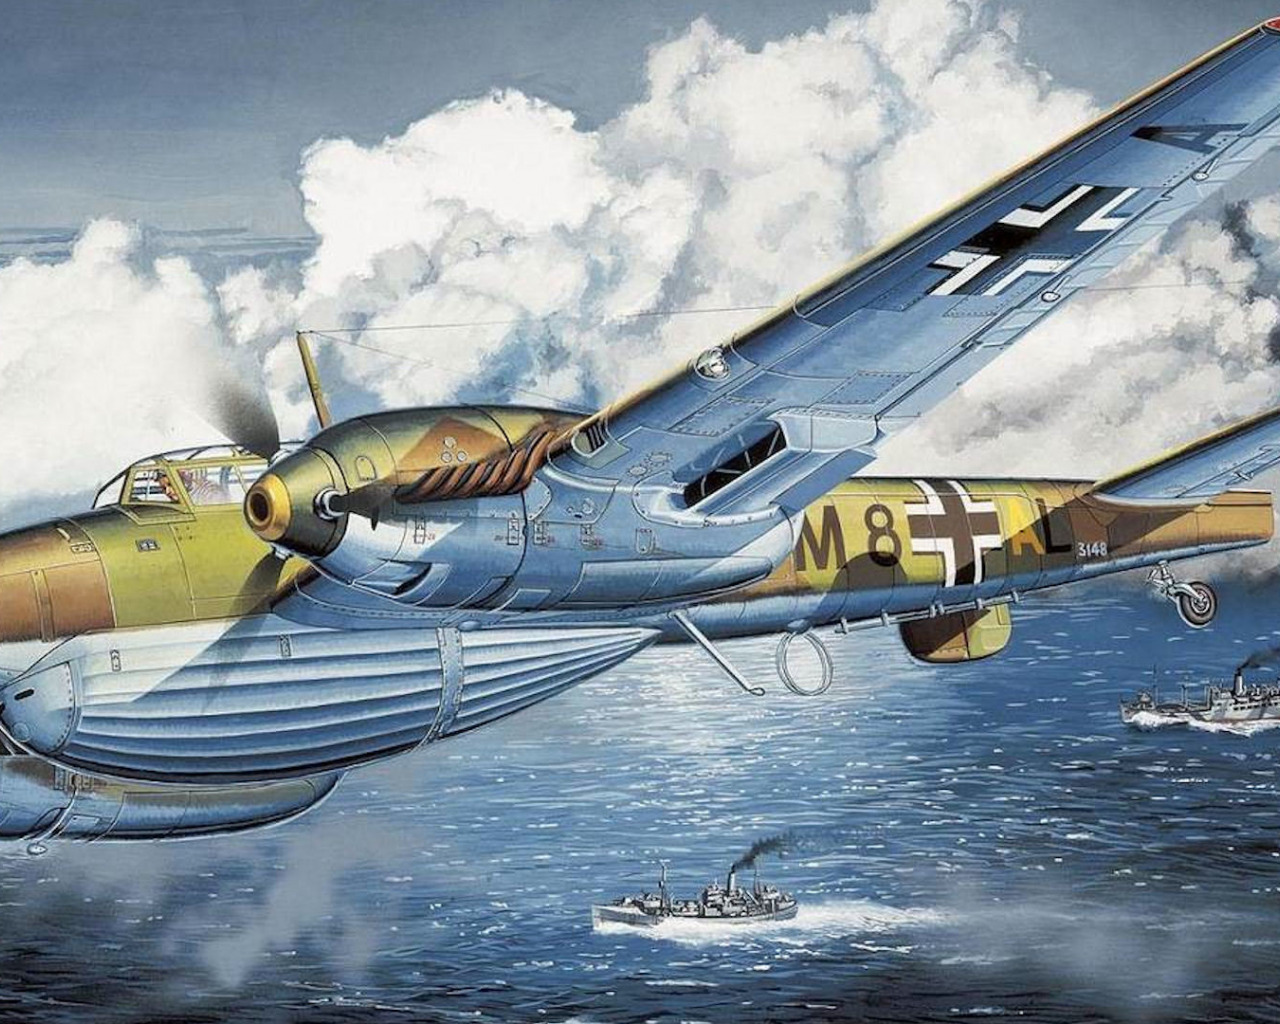 картинки немецкой авиации установки фотосетки заборе